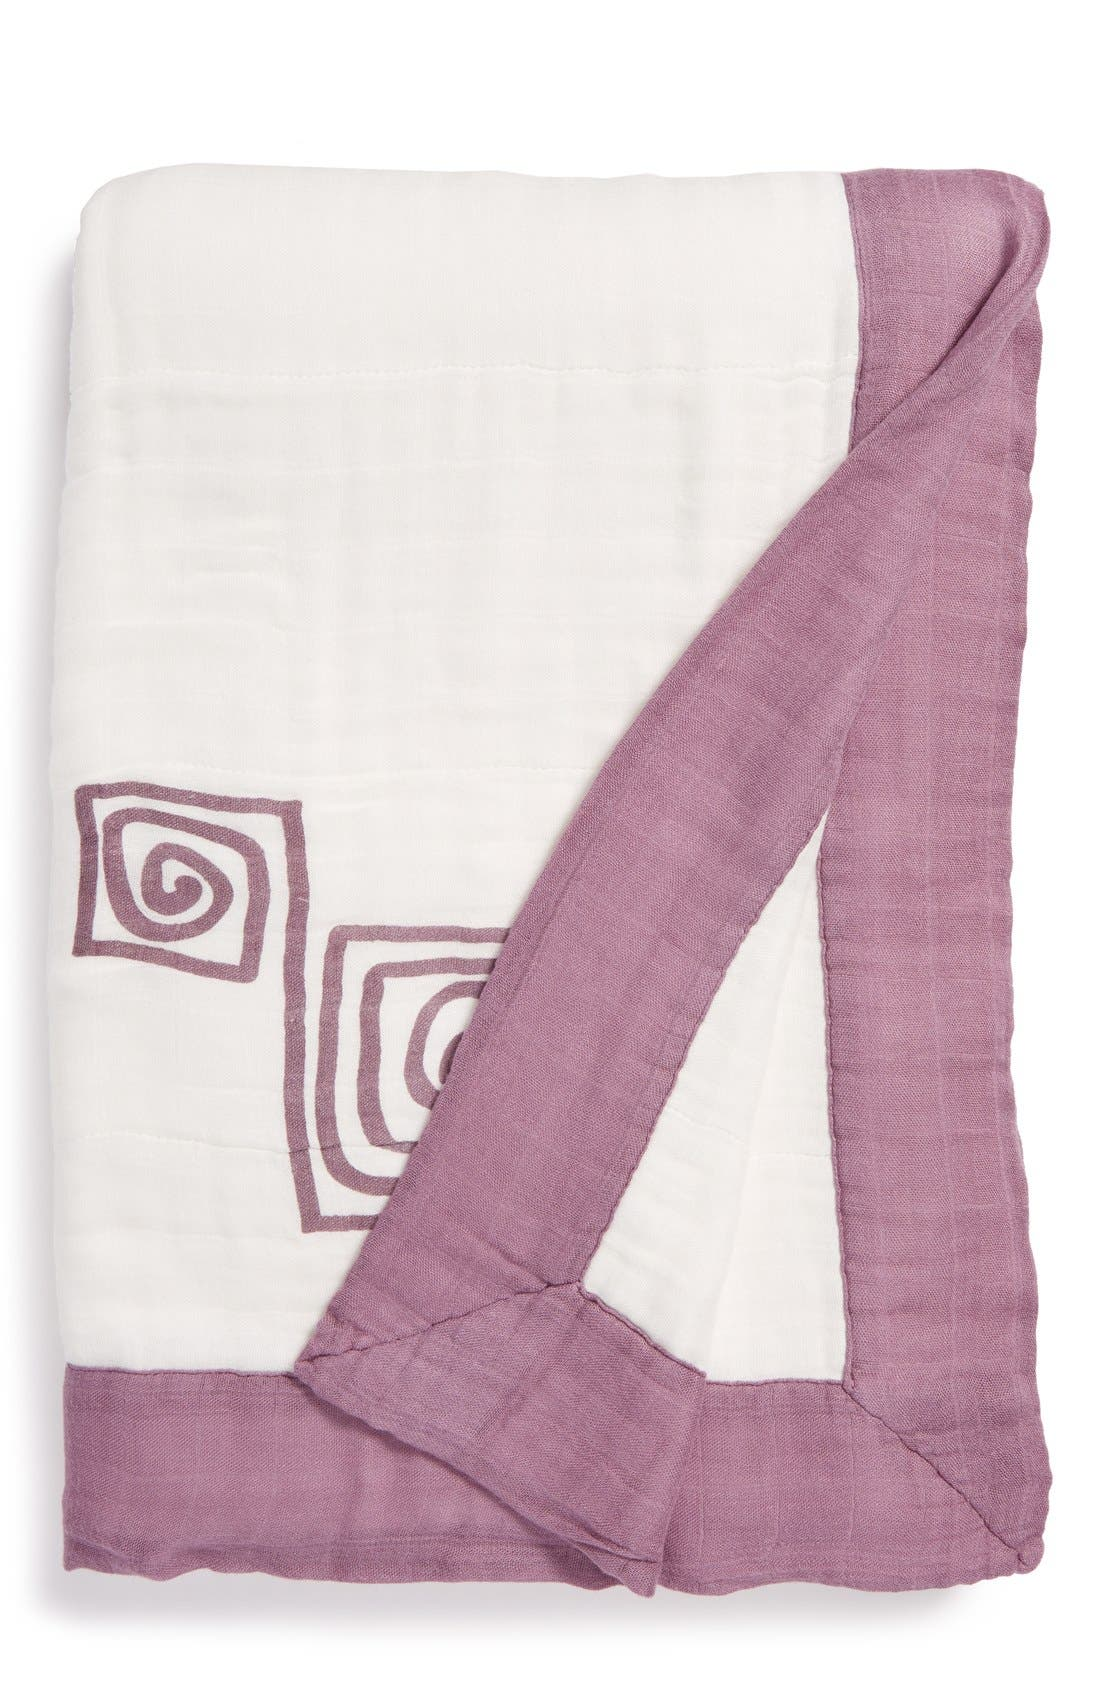 Alternate Image 3  - aden + anais Daydream Blanket™